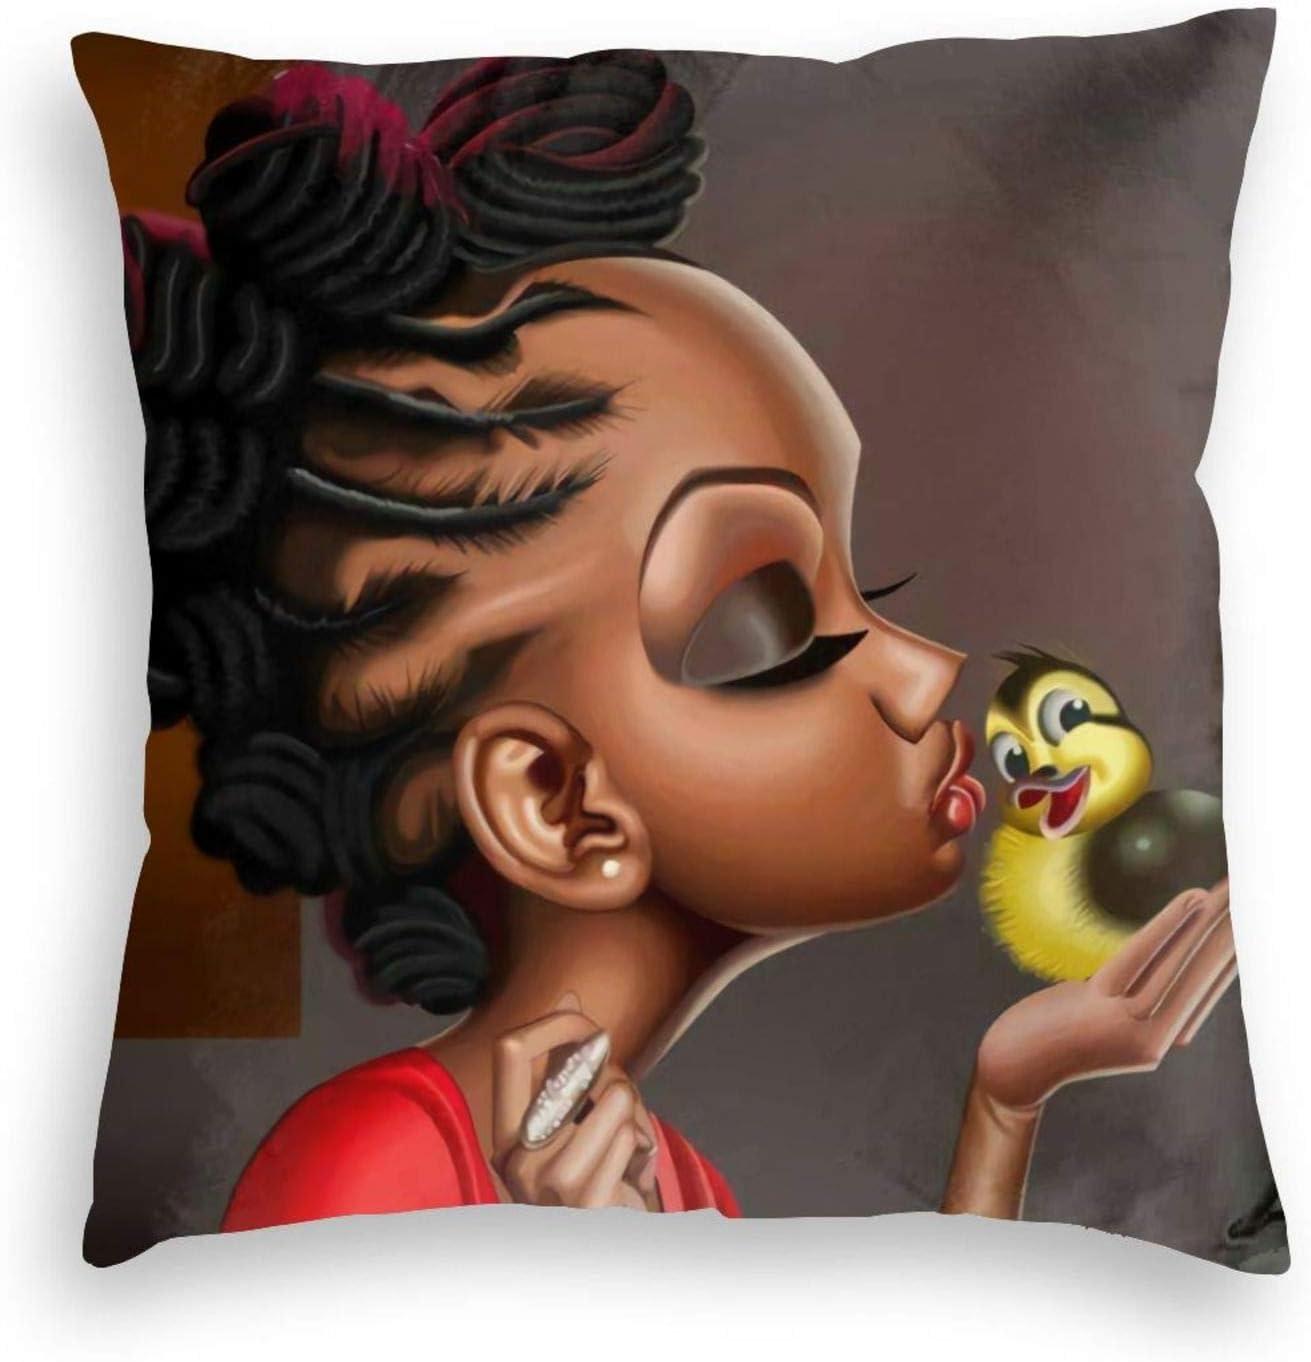 Throw Pillow Cover African Black Girl Magic Pattern Home Decorative Velvet Square Pillow Case for Men Women Boy Gilrs Bedroom Livingroom Cushion Cover 18x18 Inch Pillowcase